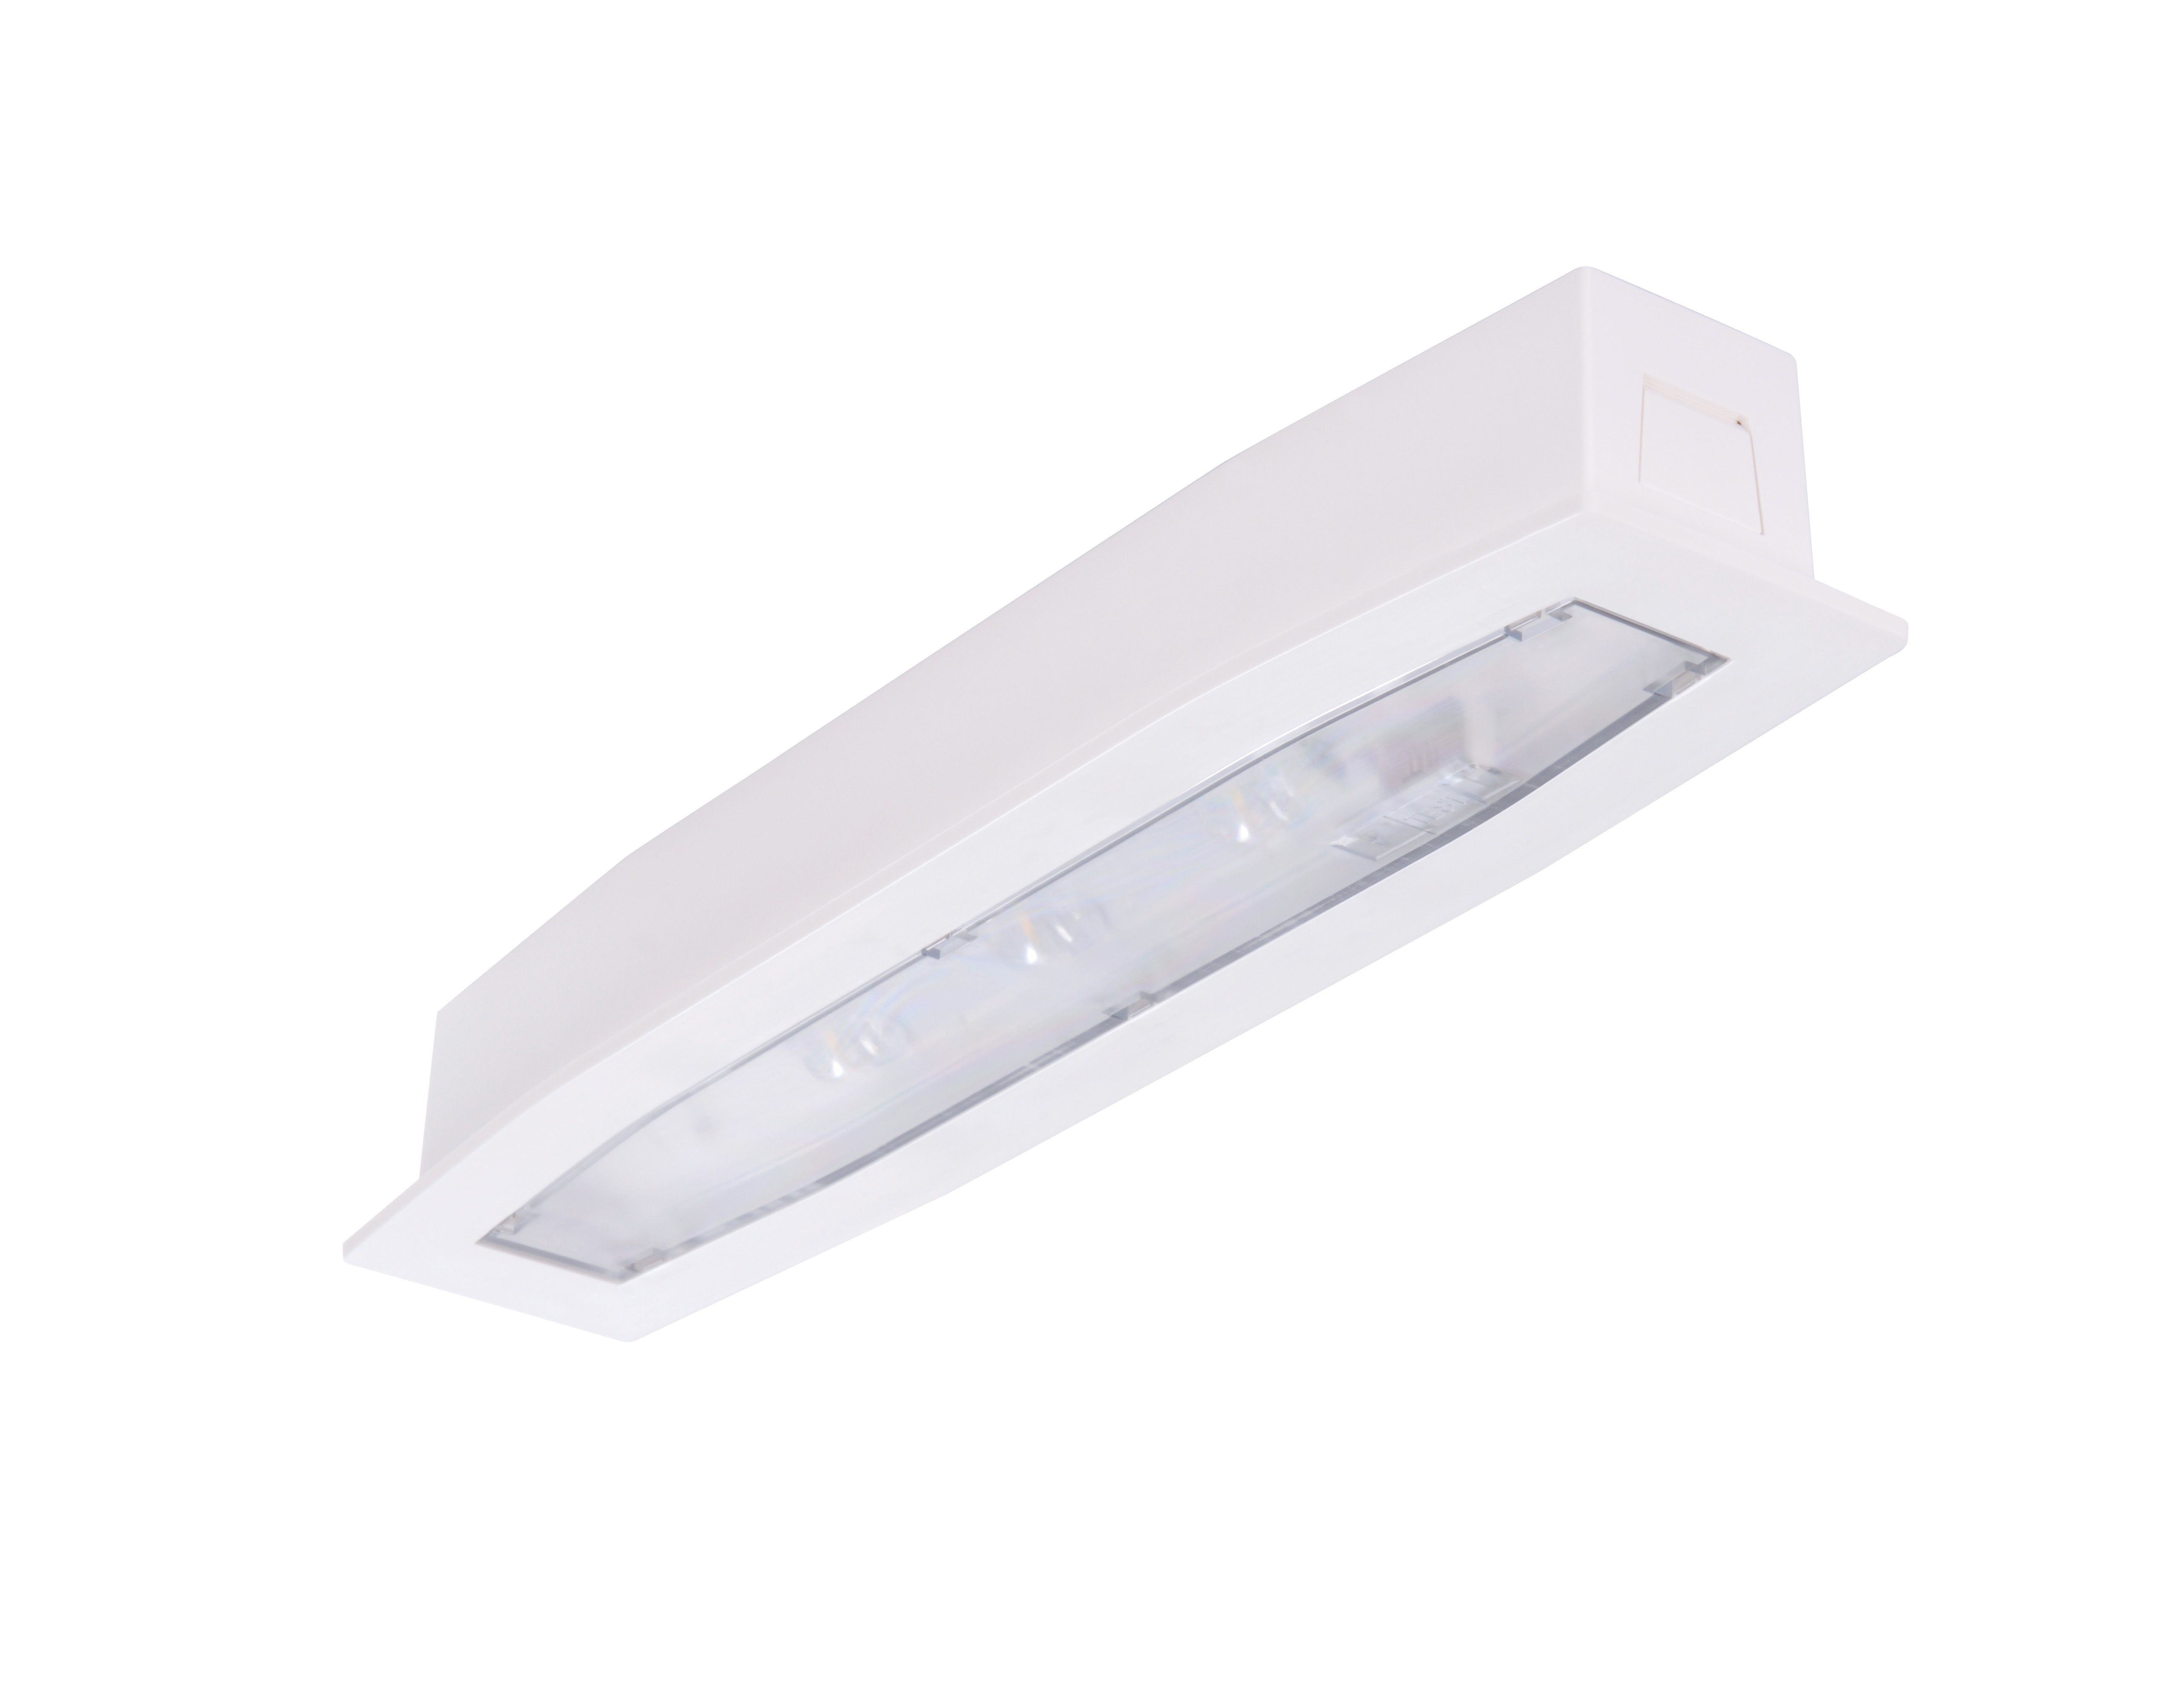 Lampa emergenta led Intelight 94525   2h nementinut test automat 3